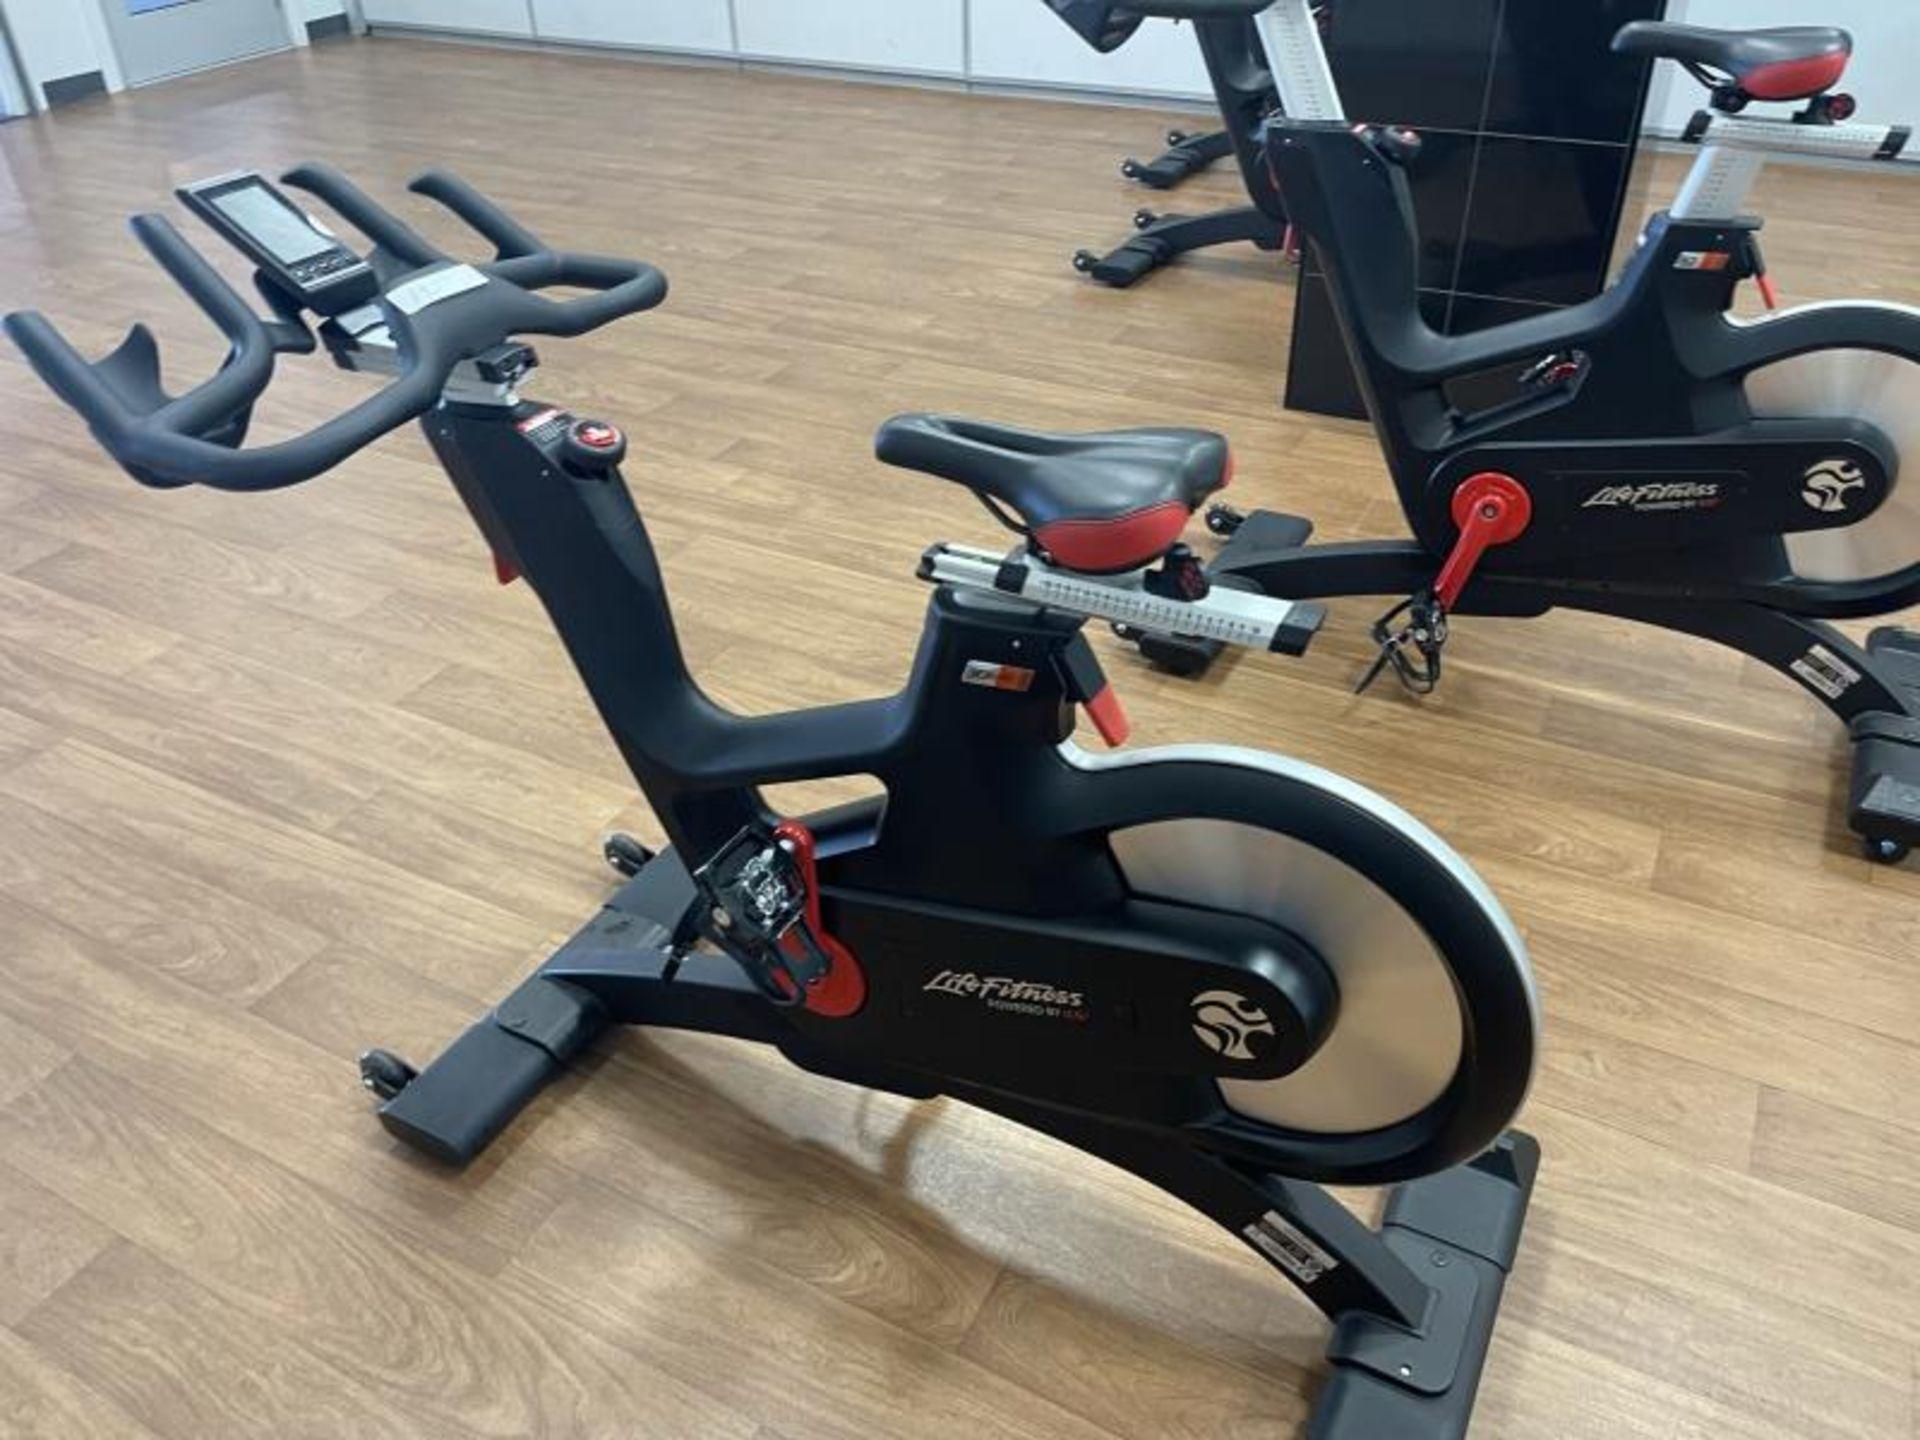 2018 Life Fitness IC7 Spin Bikes M: IC-LFIC7B2-01 - Image 3 of 5